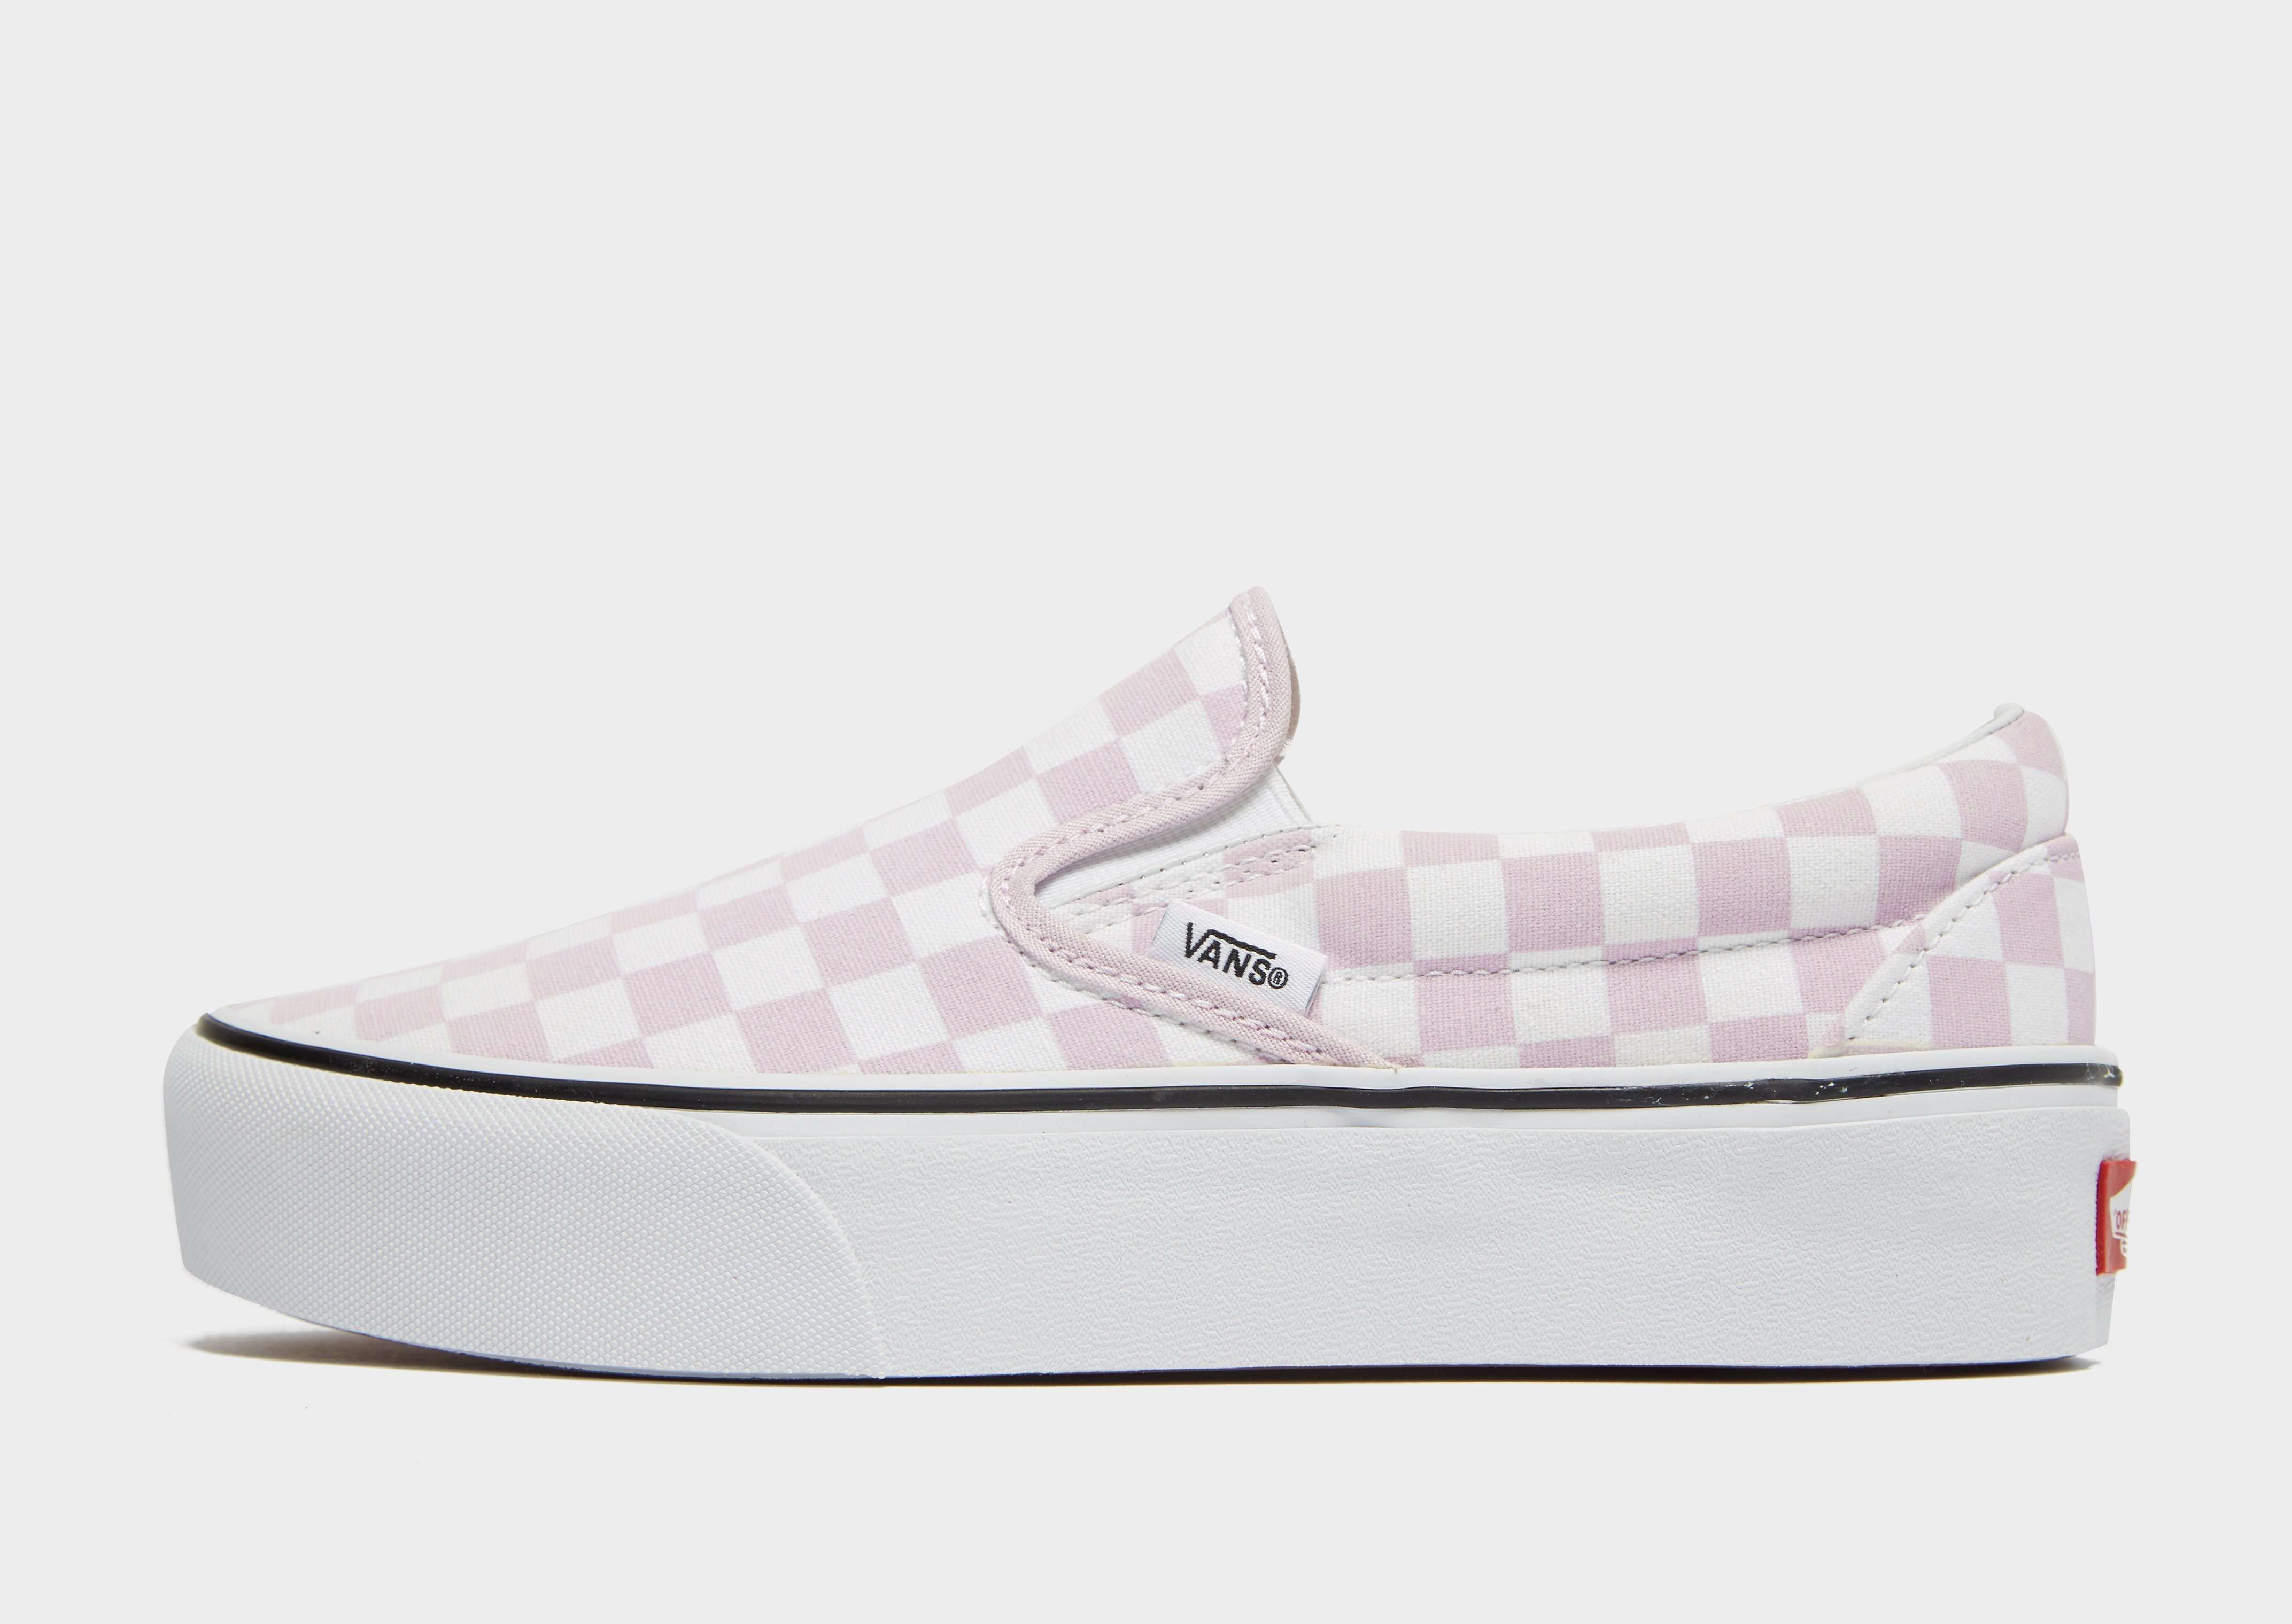 Vans shoes fashion, Vans slip on